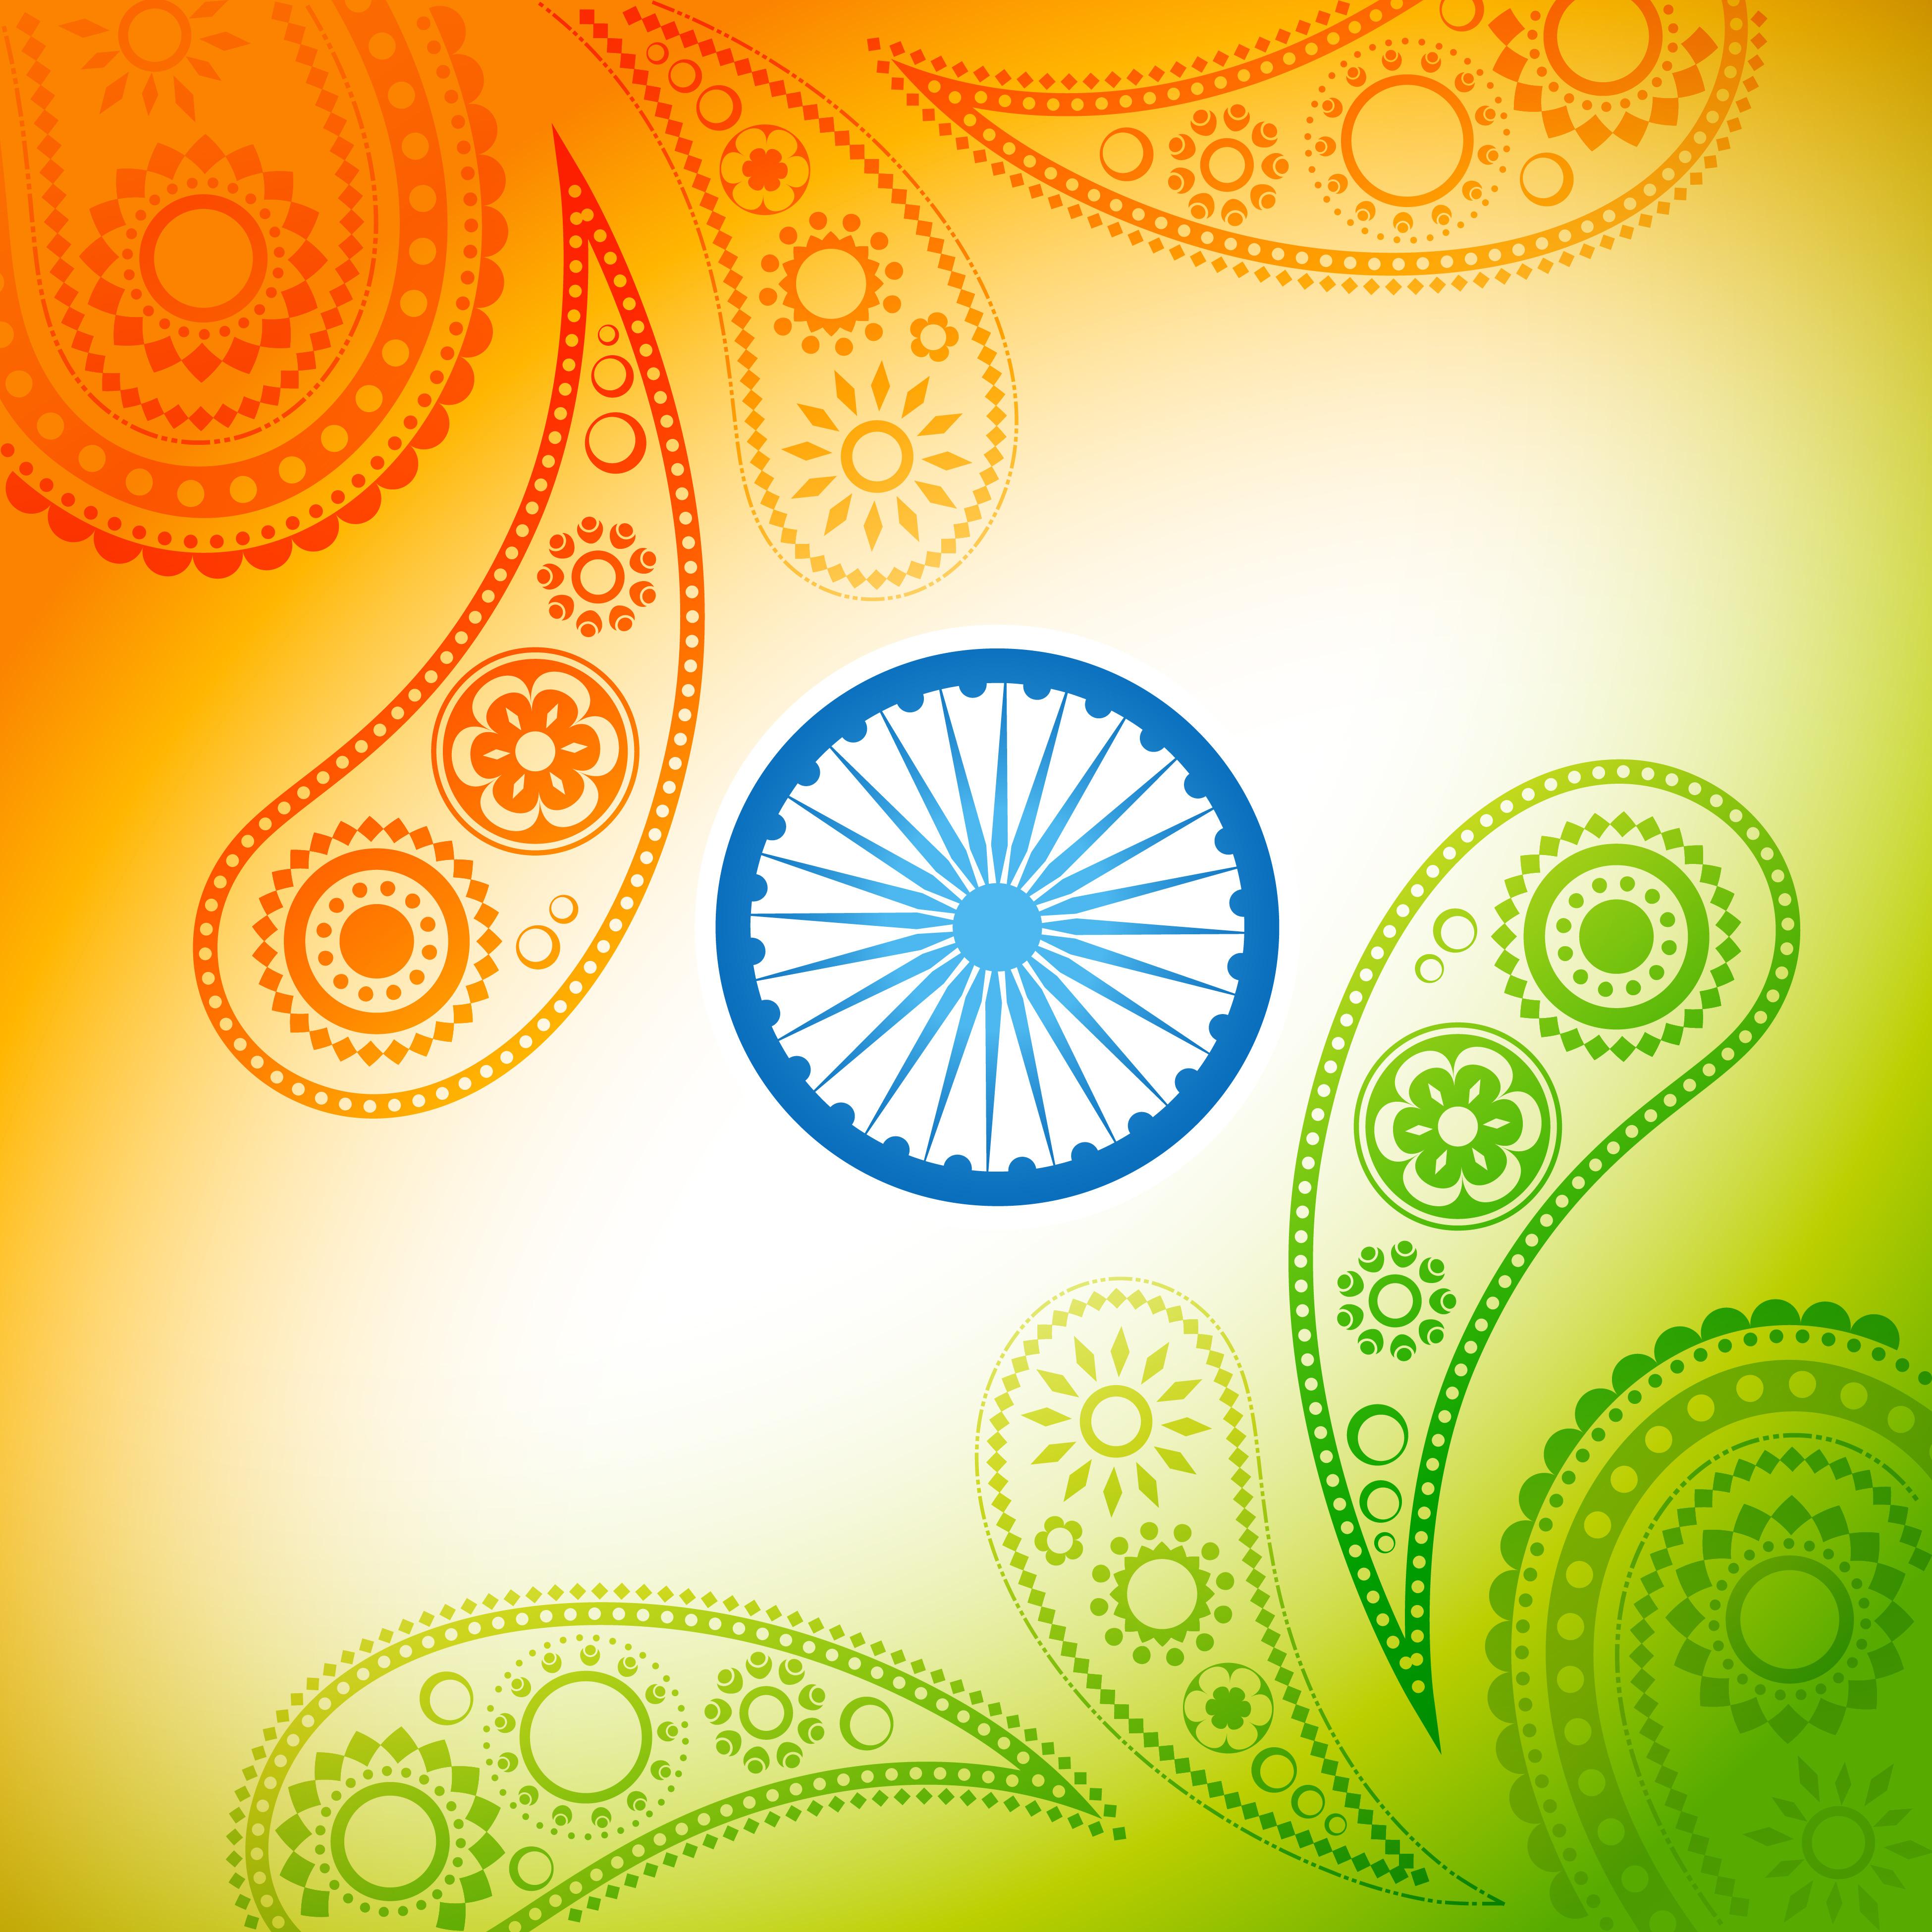 Beautiful Indian Flag Design 221211 Vector Art At Vecteezy